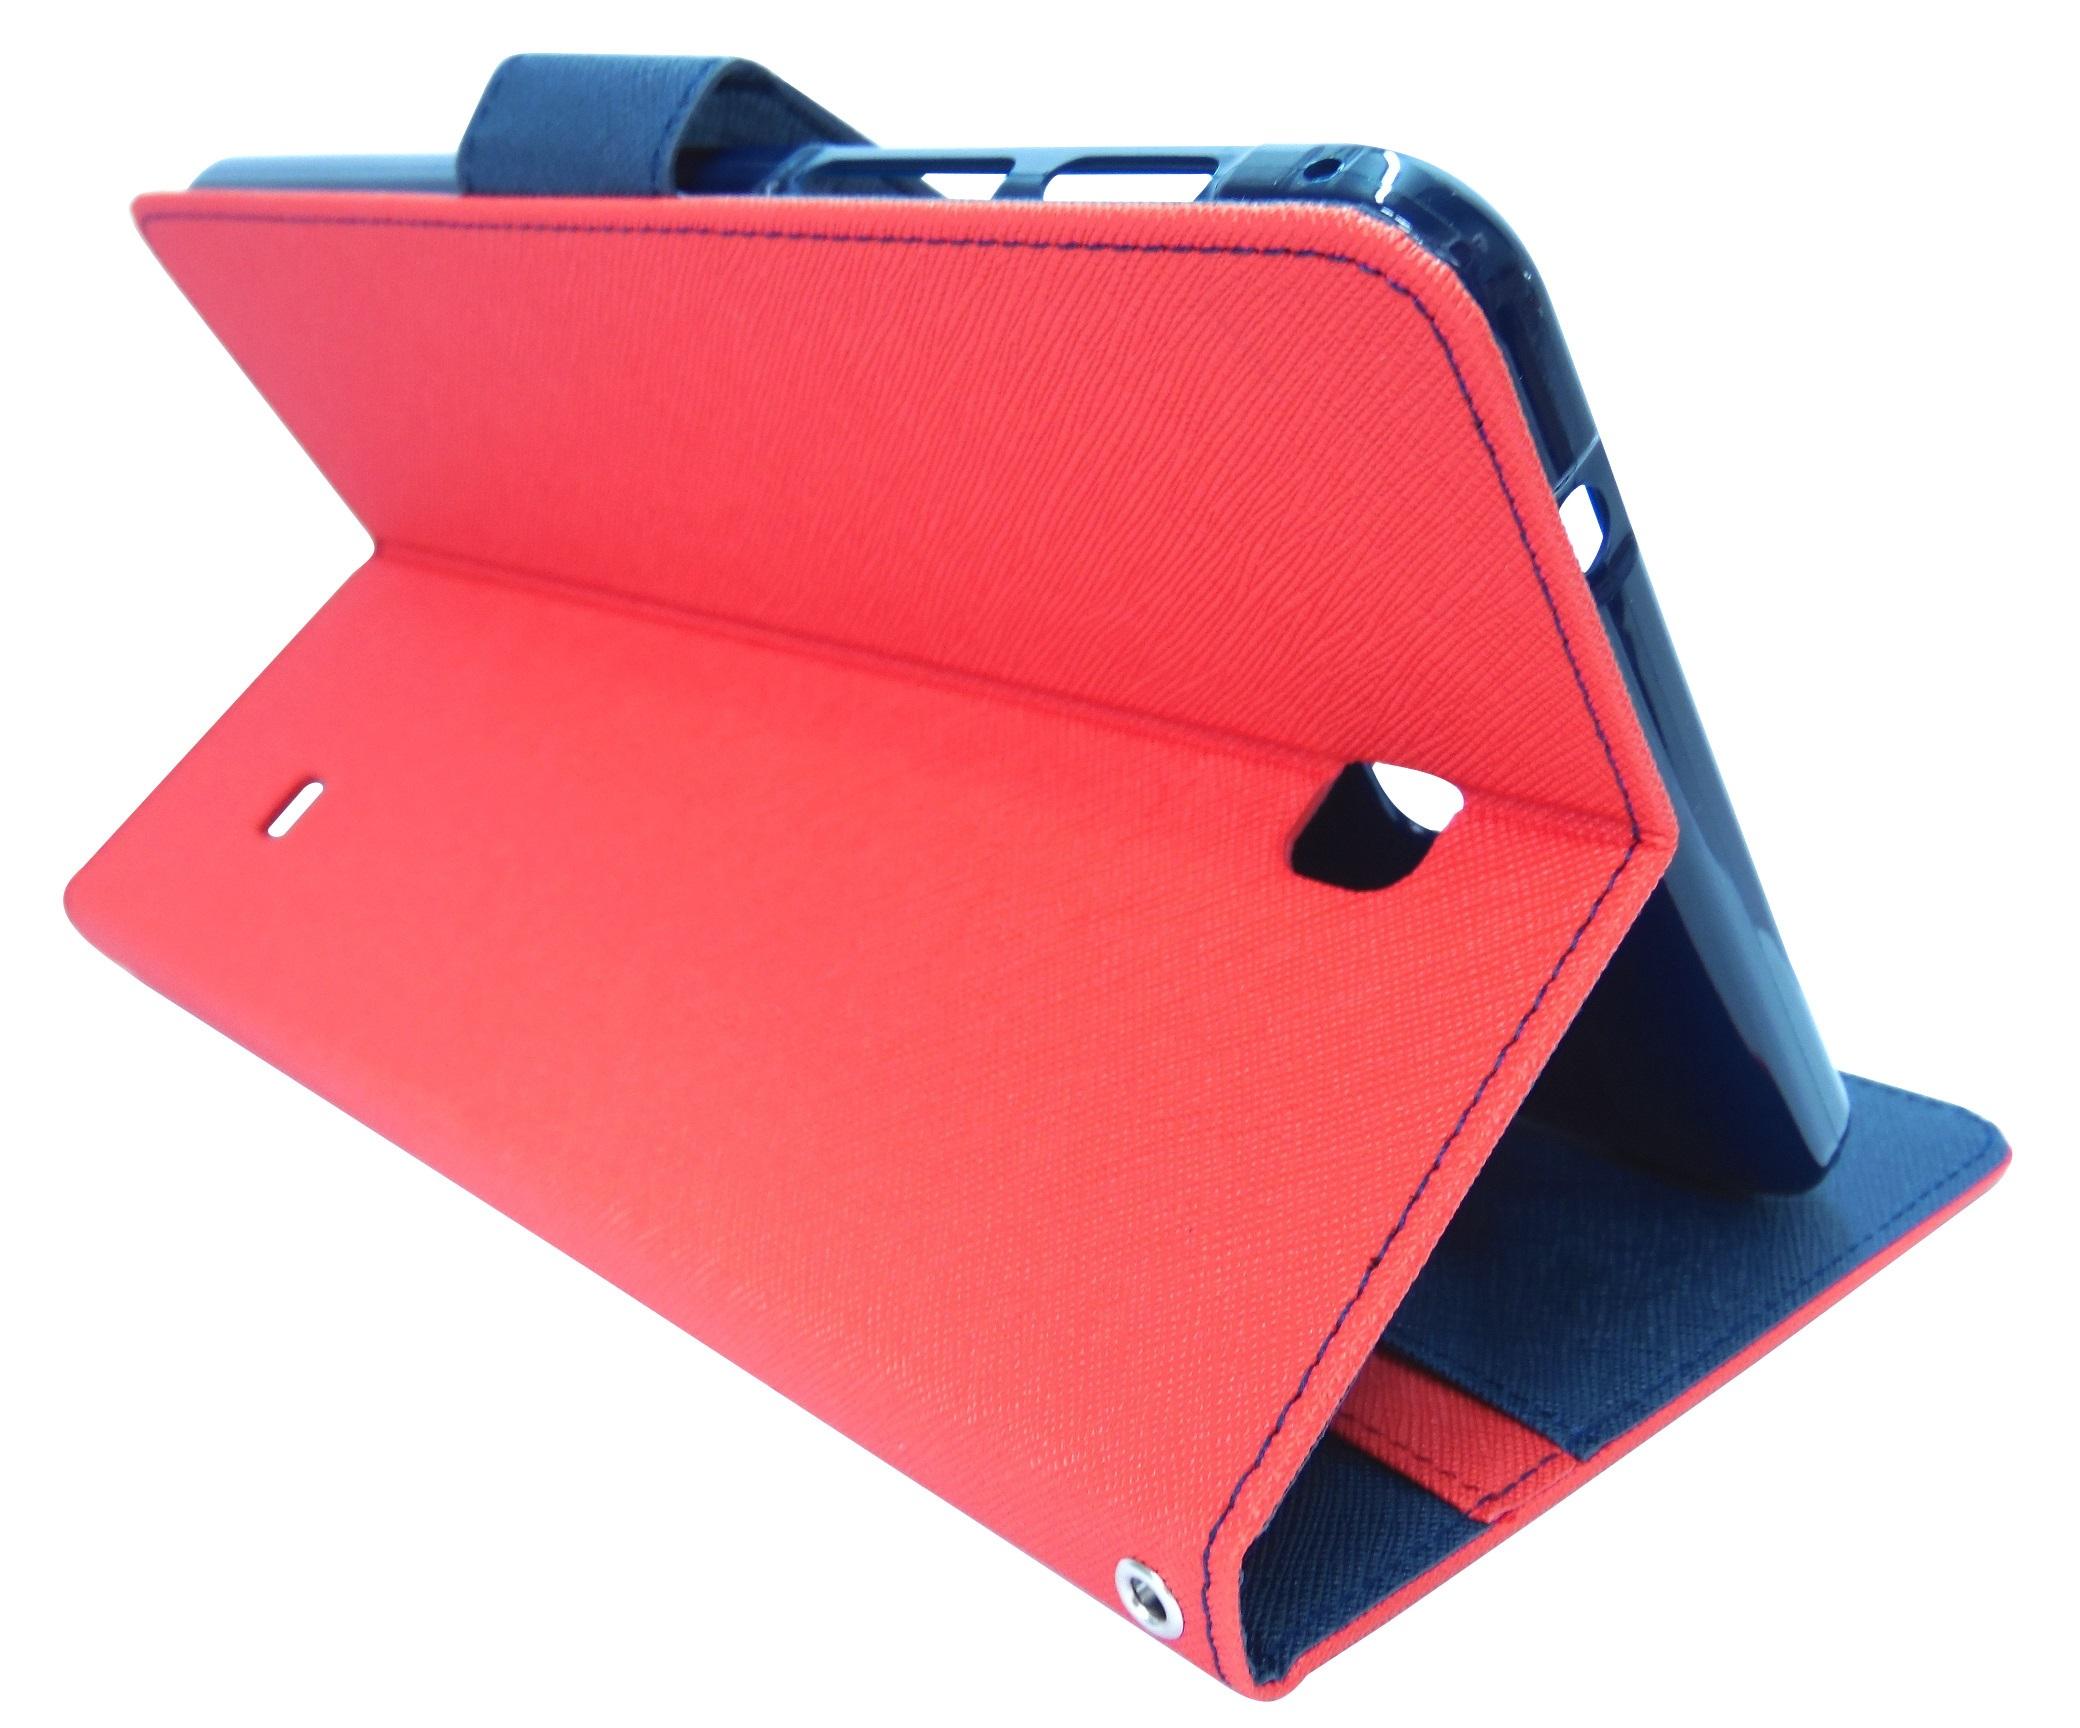 Husa tip carte Mercury Goospery Fancy Diary rosu + bleumarin pentru Samsung Galaxy Tab 4 8.0 (SM-T330), Tab 4 8.0 LTE (SM-T335)